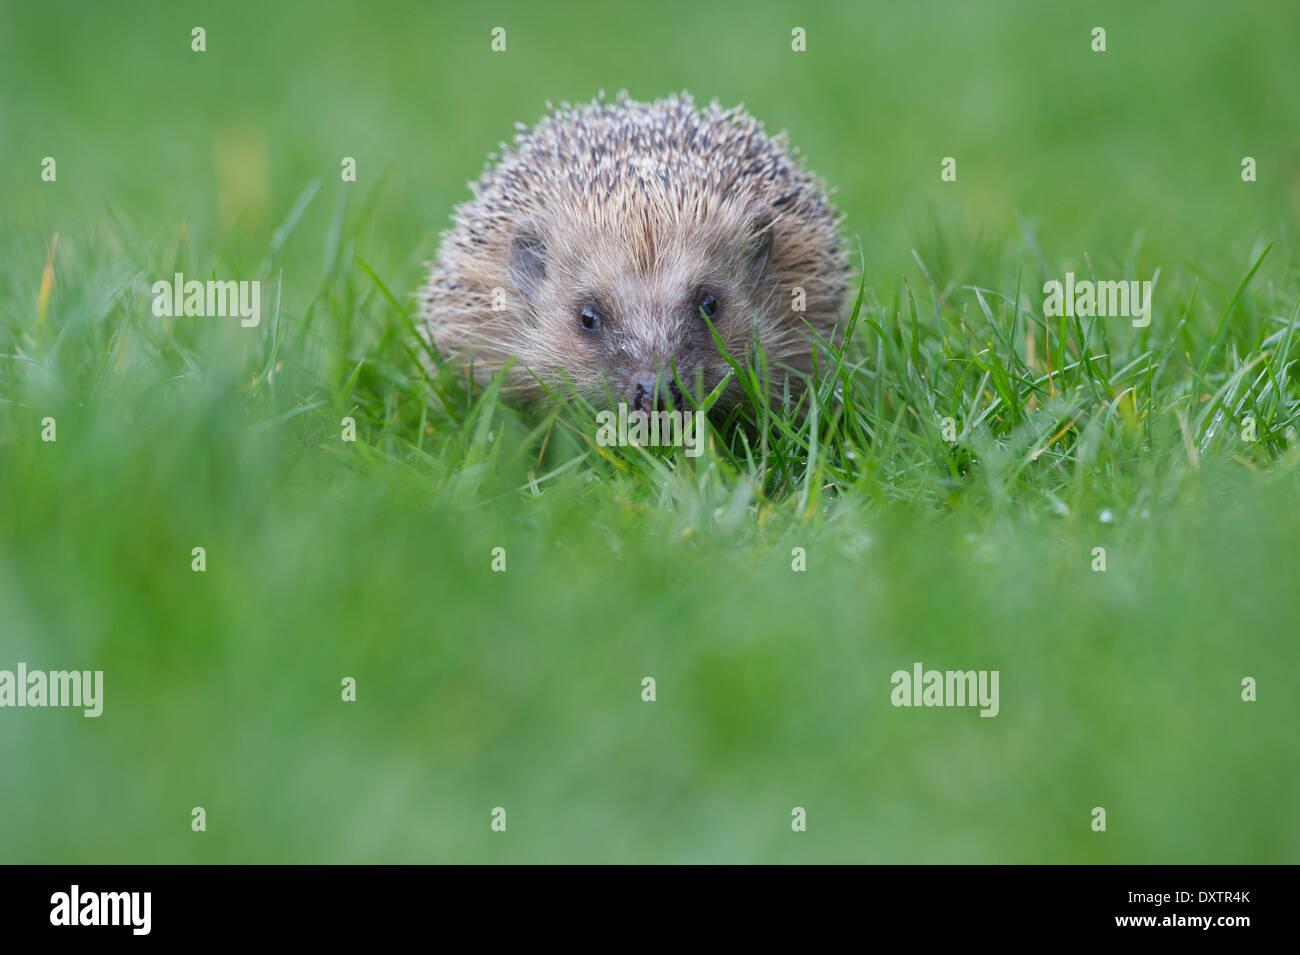 European hedgehog (Erinaceus europaeus) - Stock Image